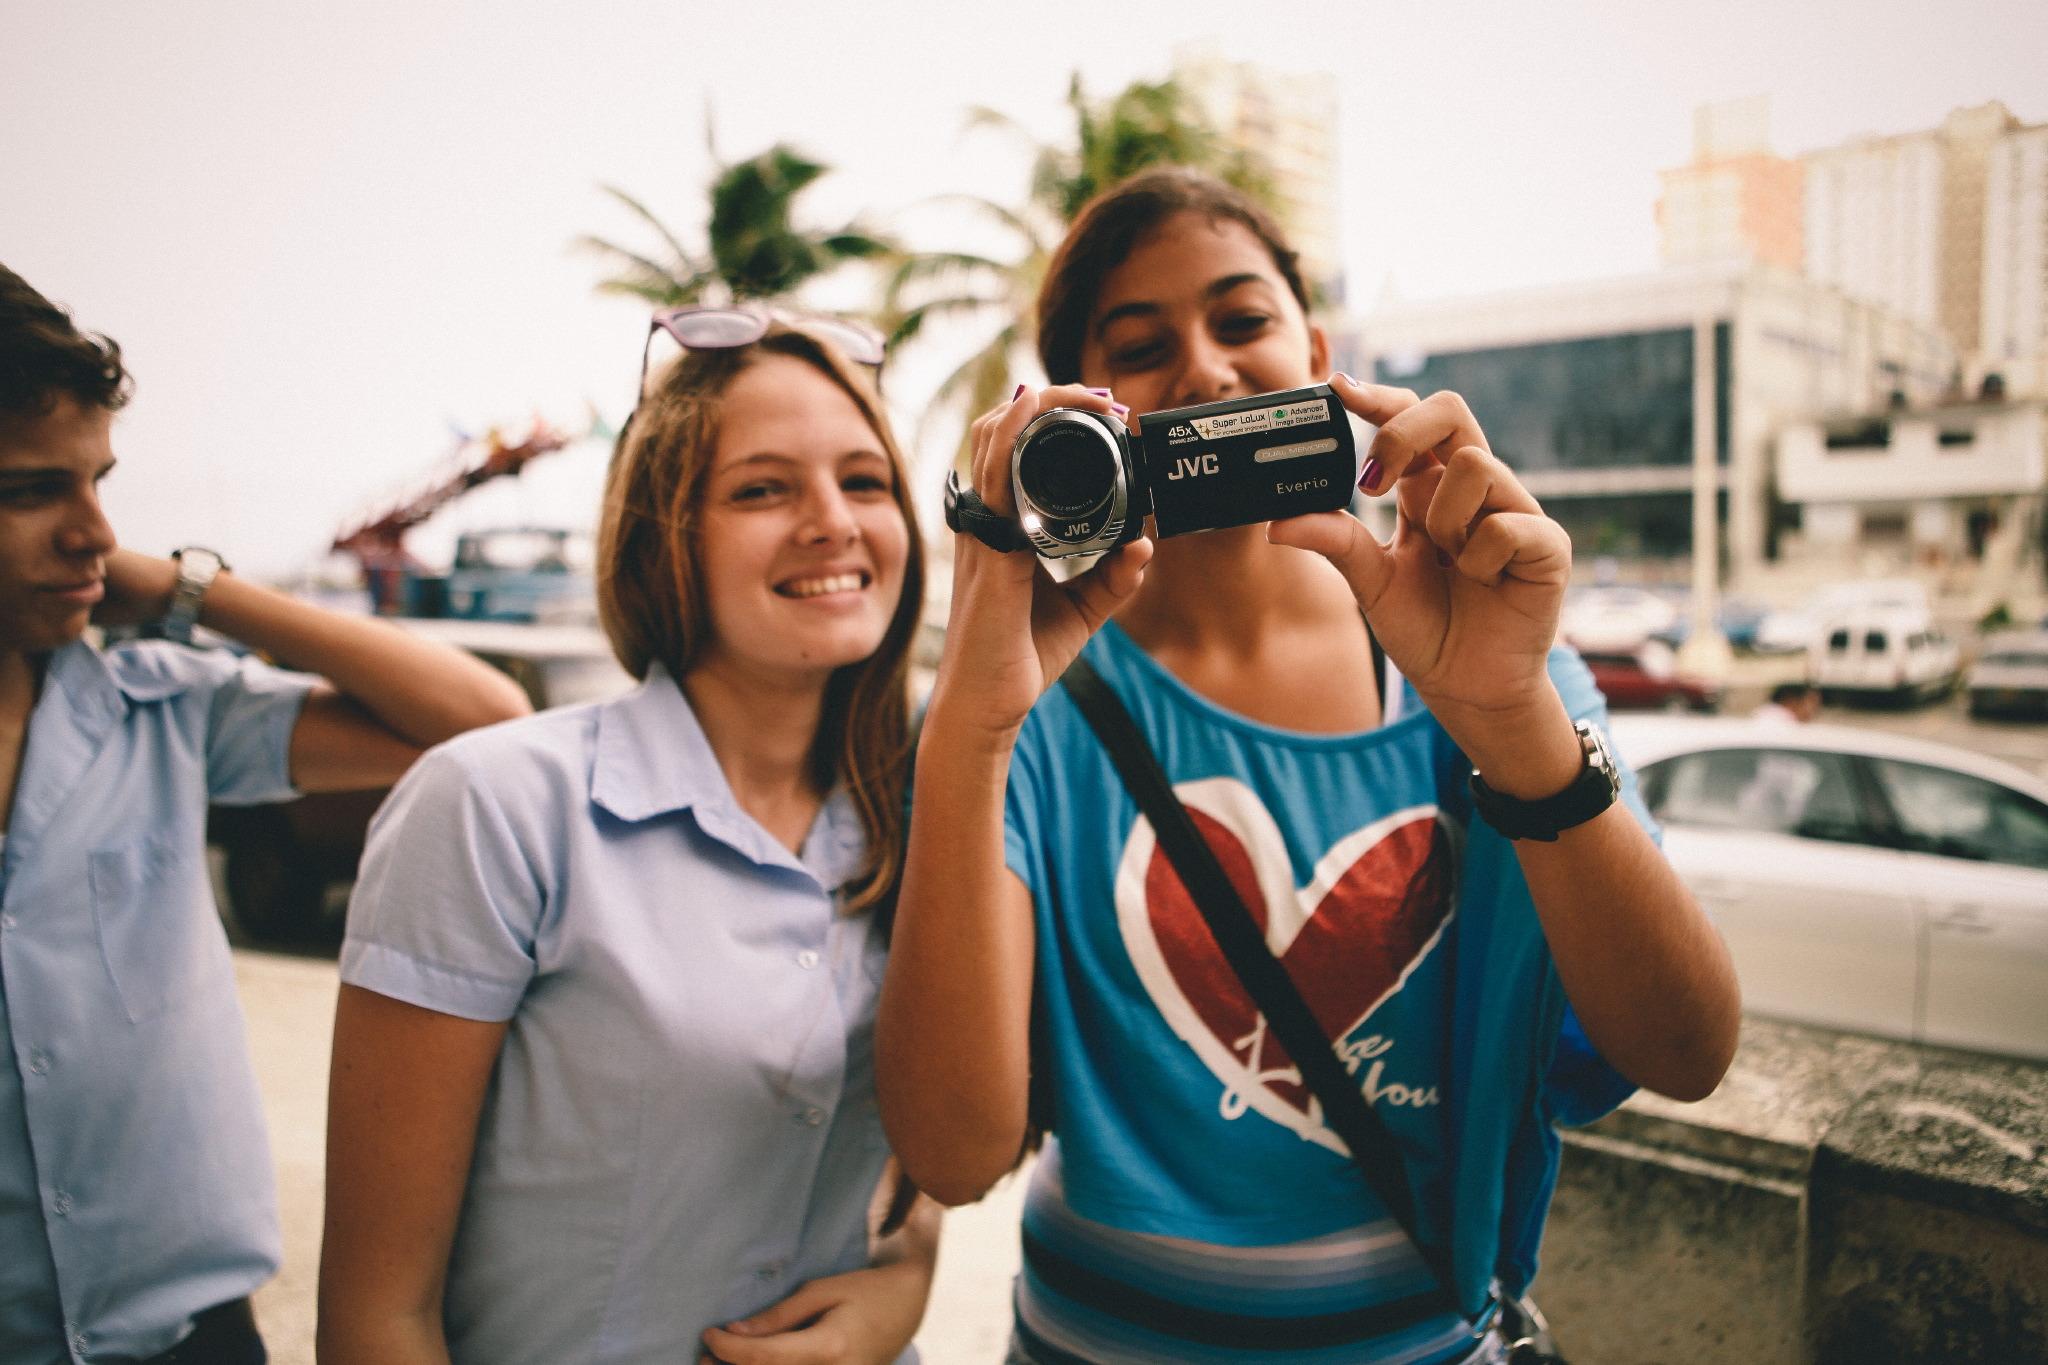 san diego wedding   photographer | women with digicam smiling